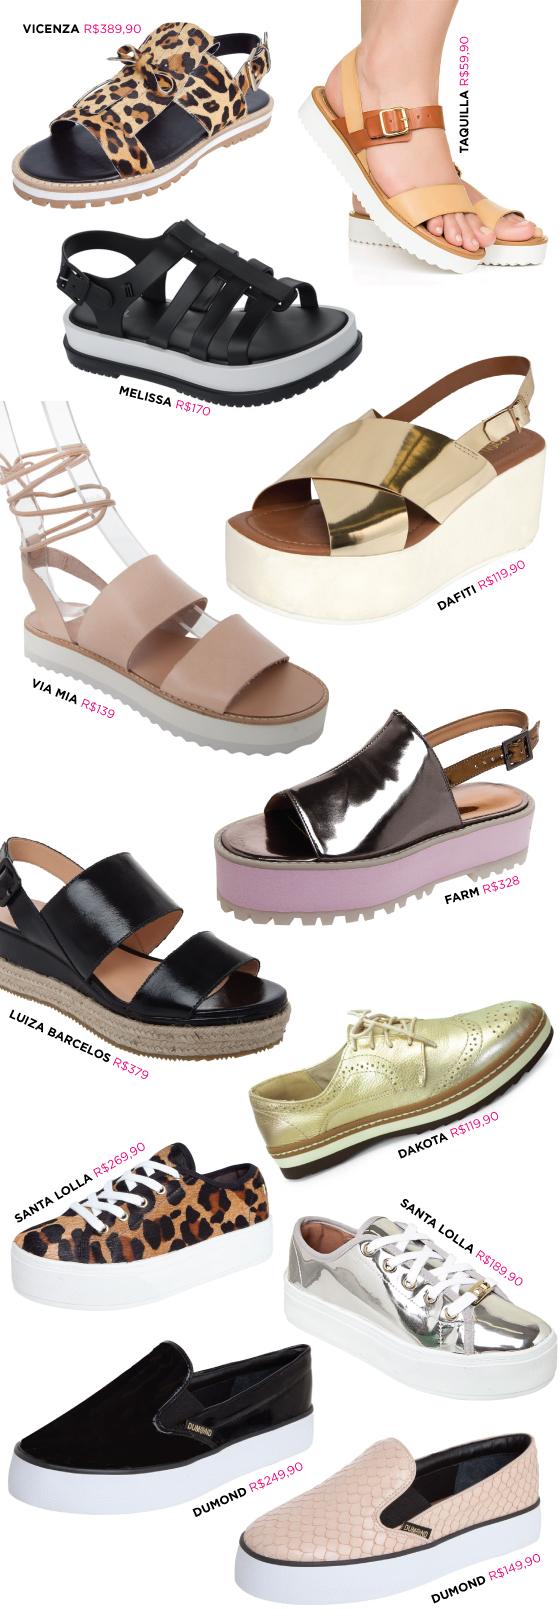 flatform-sapato-plataforma-tenis-onde-comprar-moda-tendencia-trend-dica-barato-achado-melissa-santa-lolla-via-mia